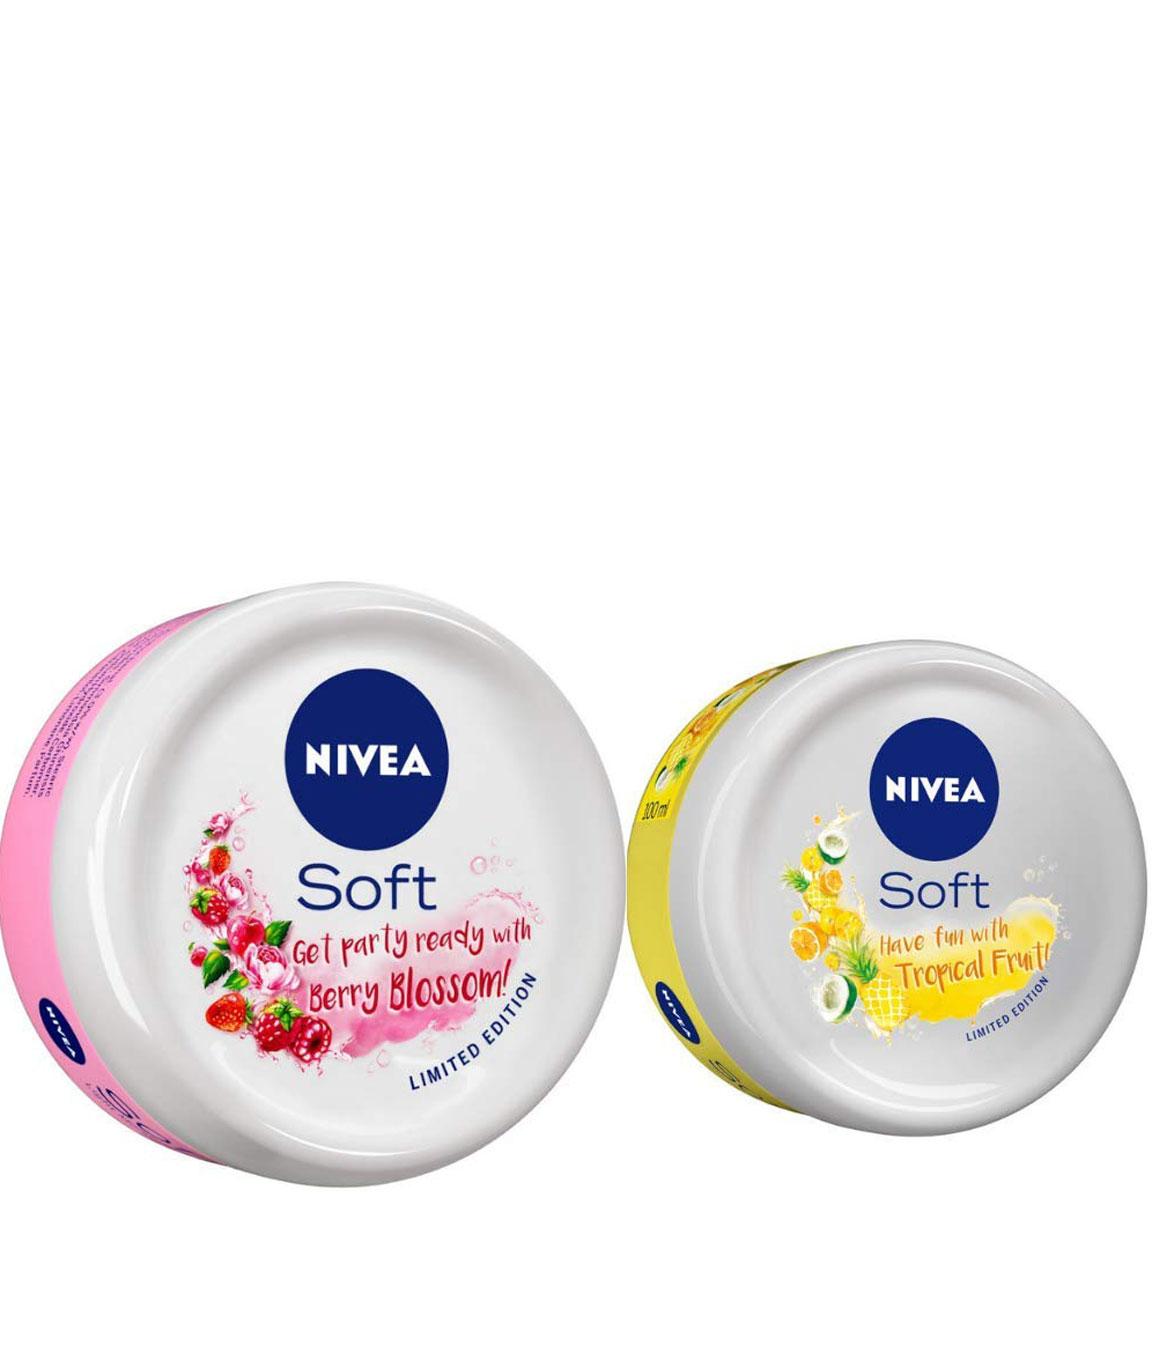 NIVEA Soft Light Moisturizer Berry Blossom With Vitamin E & Jojoba Oil, 100 ml and NIVEA Soft Light Moisturizer Tropical Fruit With Vitamin E & Jojoba Oil, 50 ml